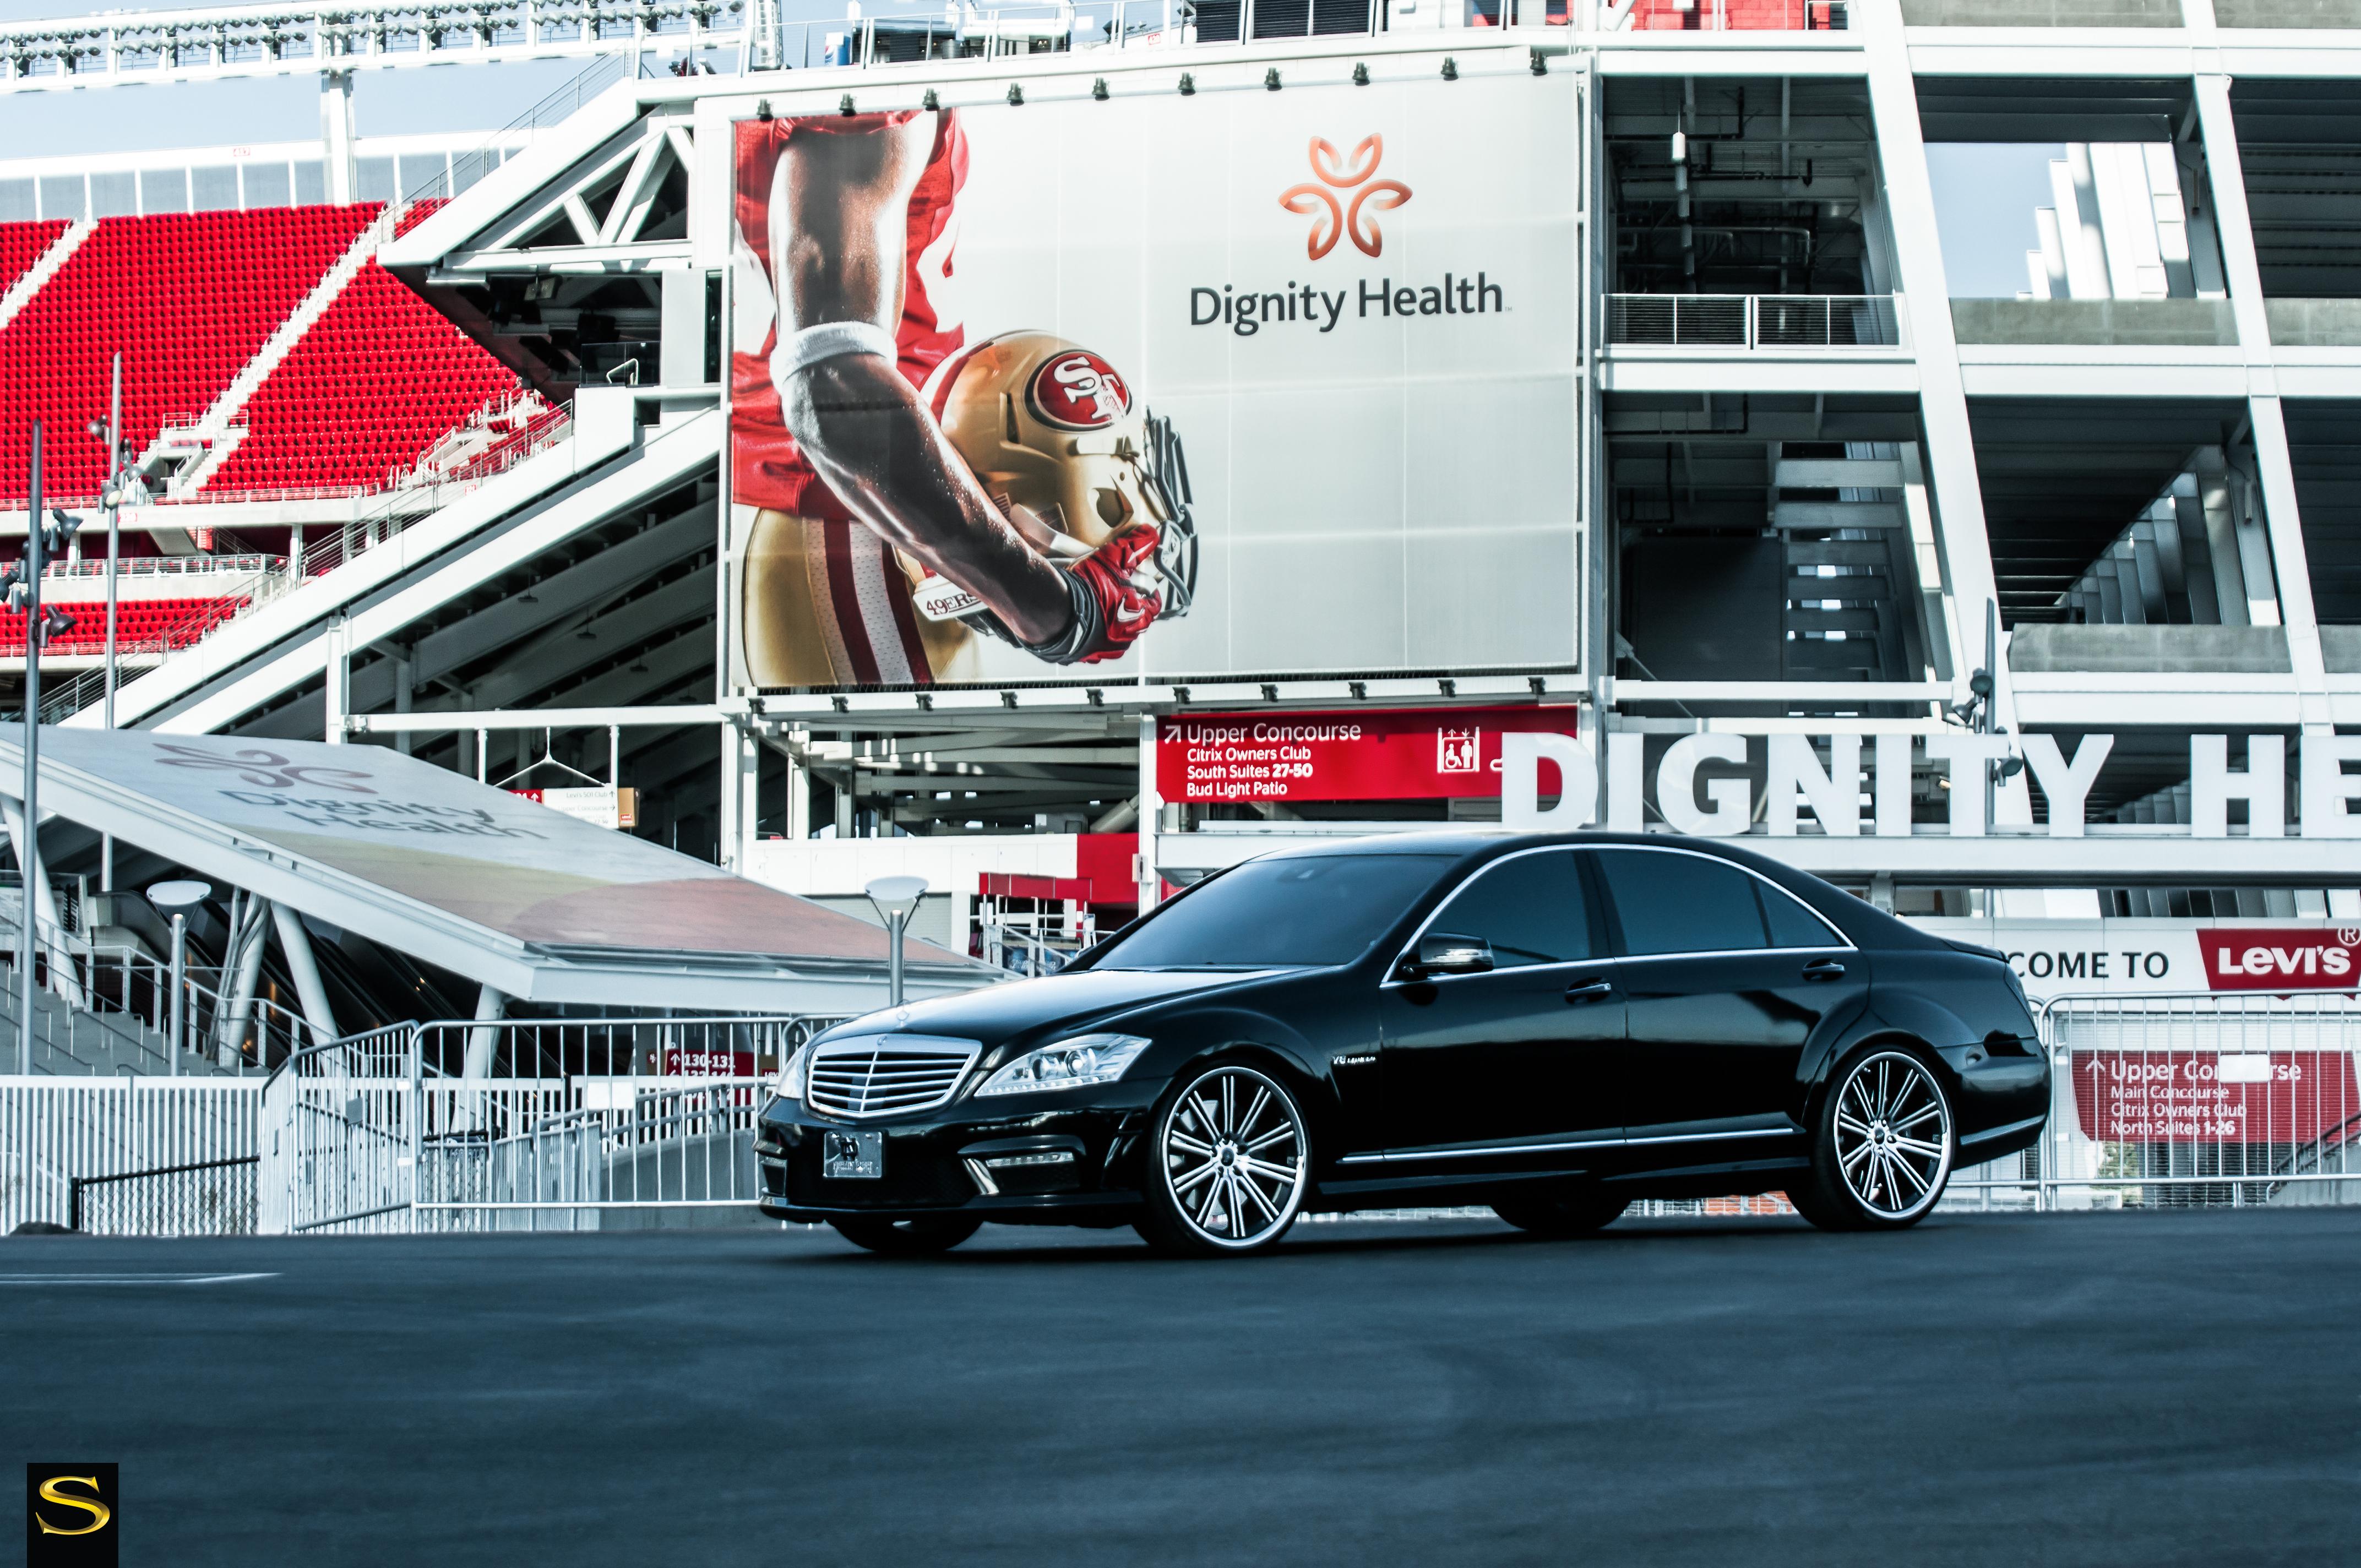 Black-California-Wheels-Mercedes-Benz-S63-Saini-Wheels-Black di-Forza-BM3-Machined-Black-Stainless-Steel-13